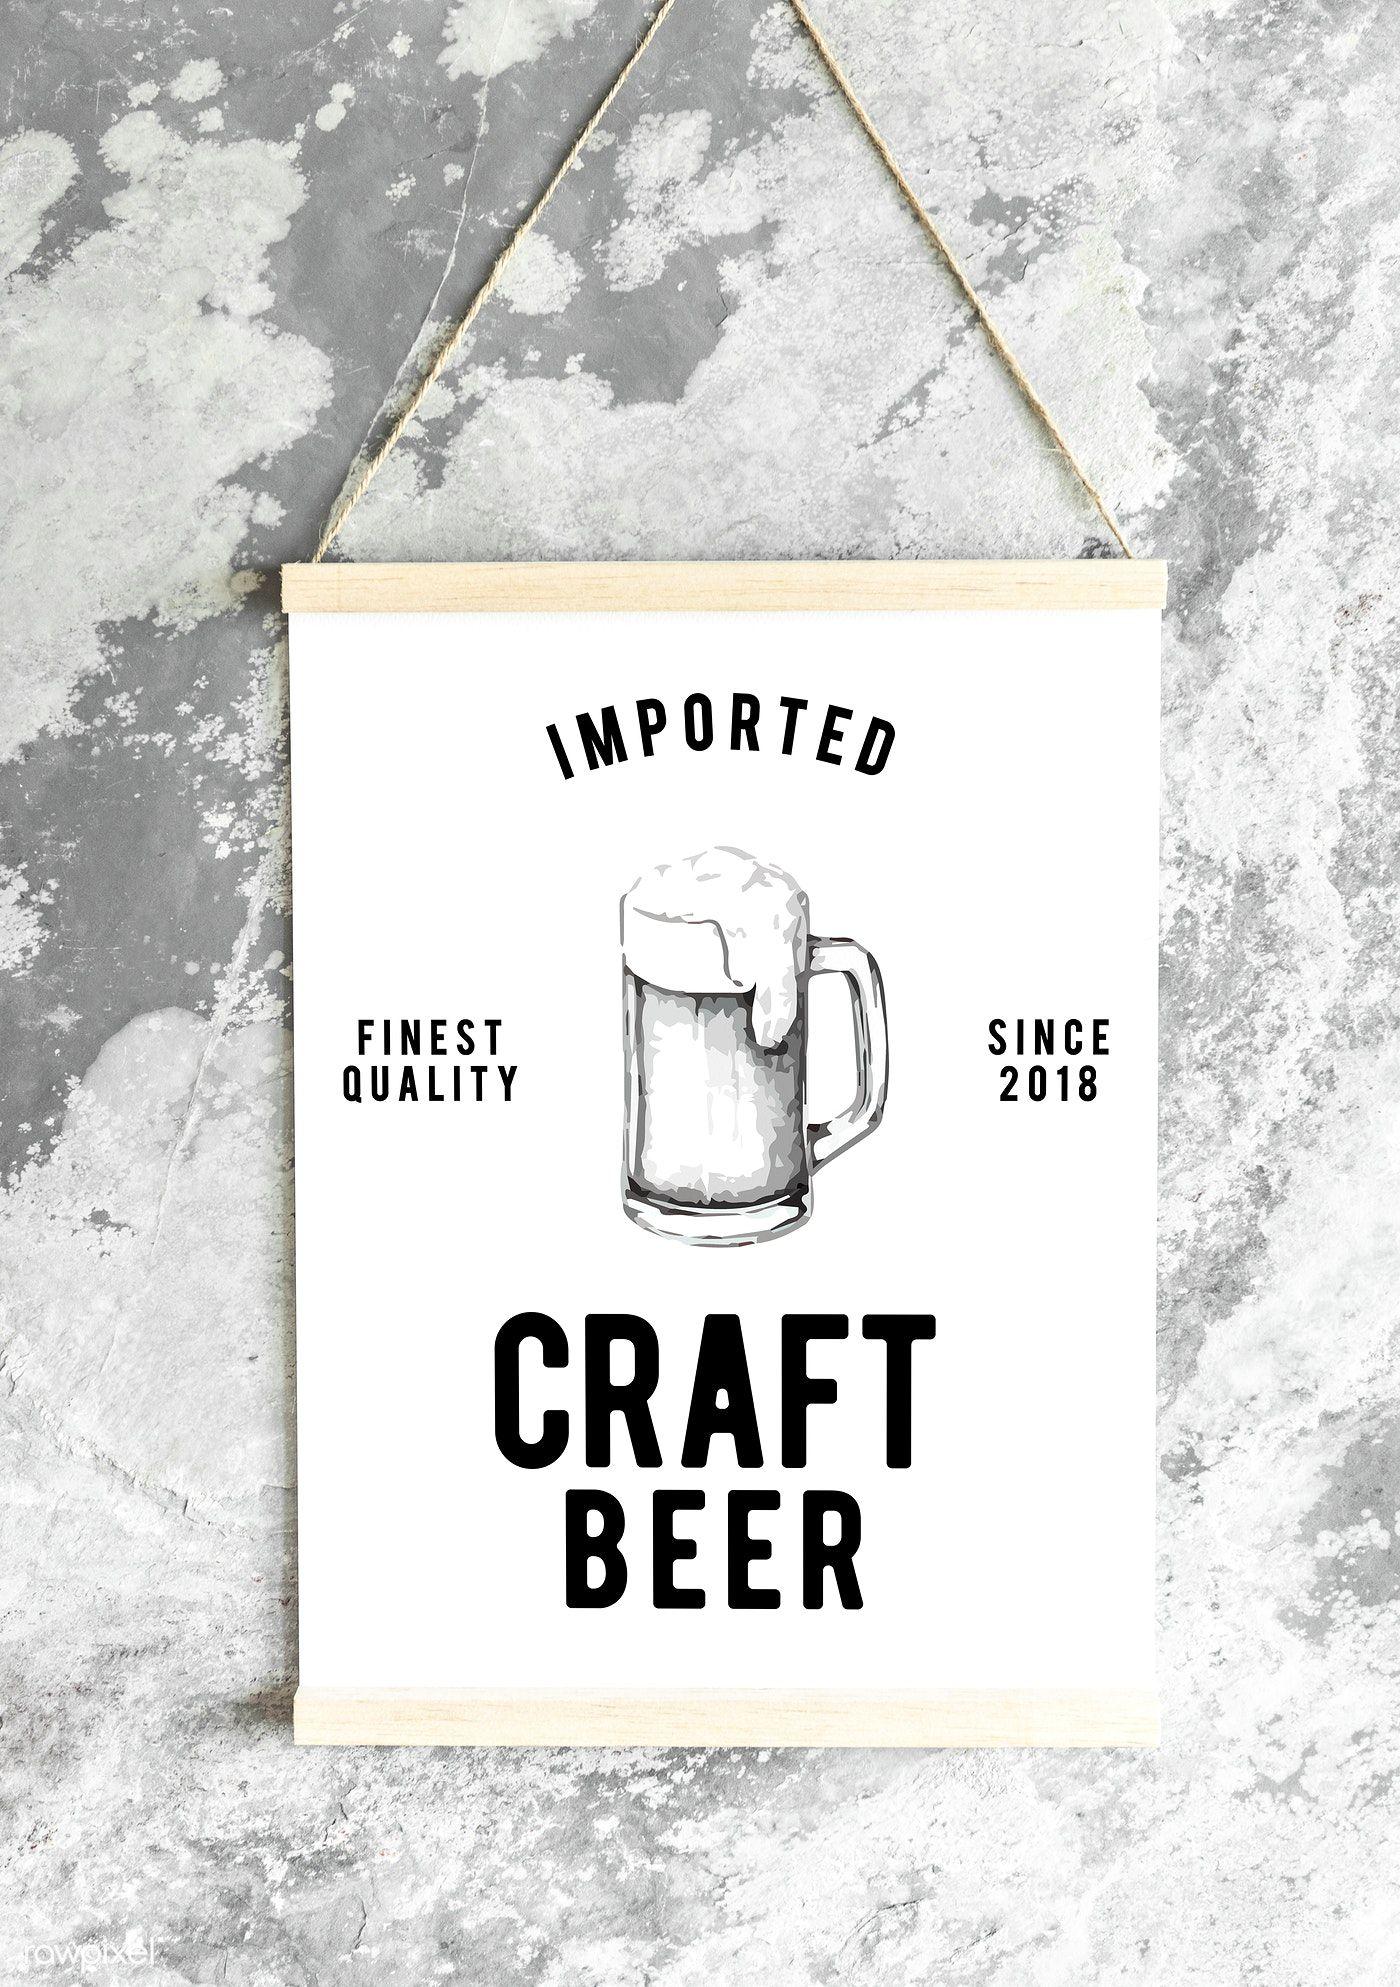 Download Premium Psd Of Craft Beer Pub Poster Mockup 531947 Beer Pub Craft Beer Poster Mockup